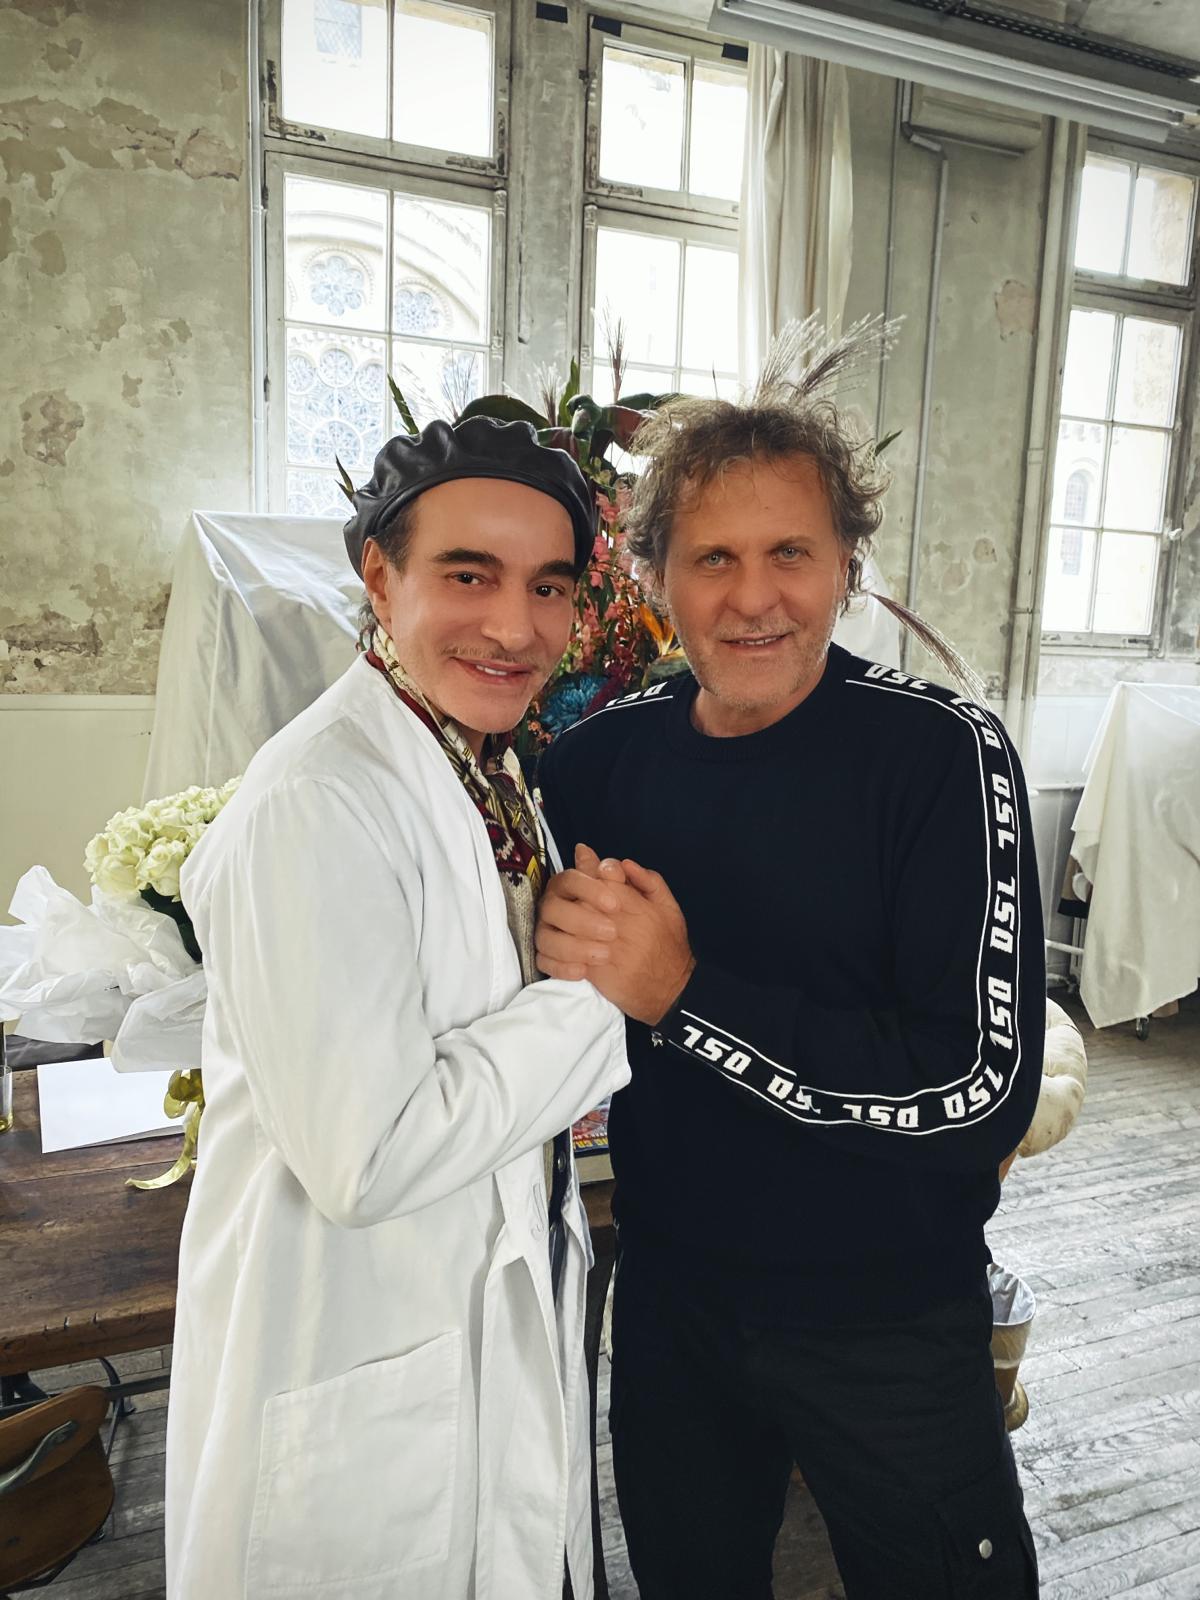 John Galliano and Renzo Rosso